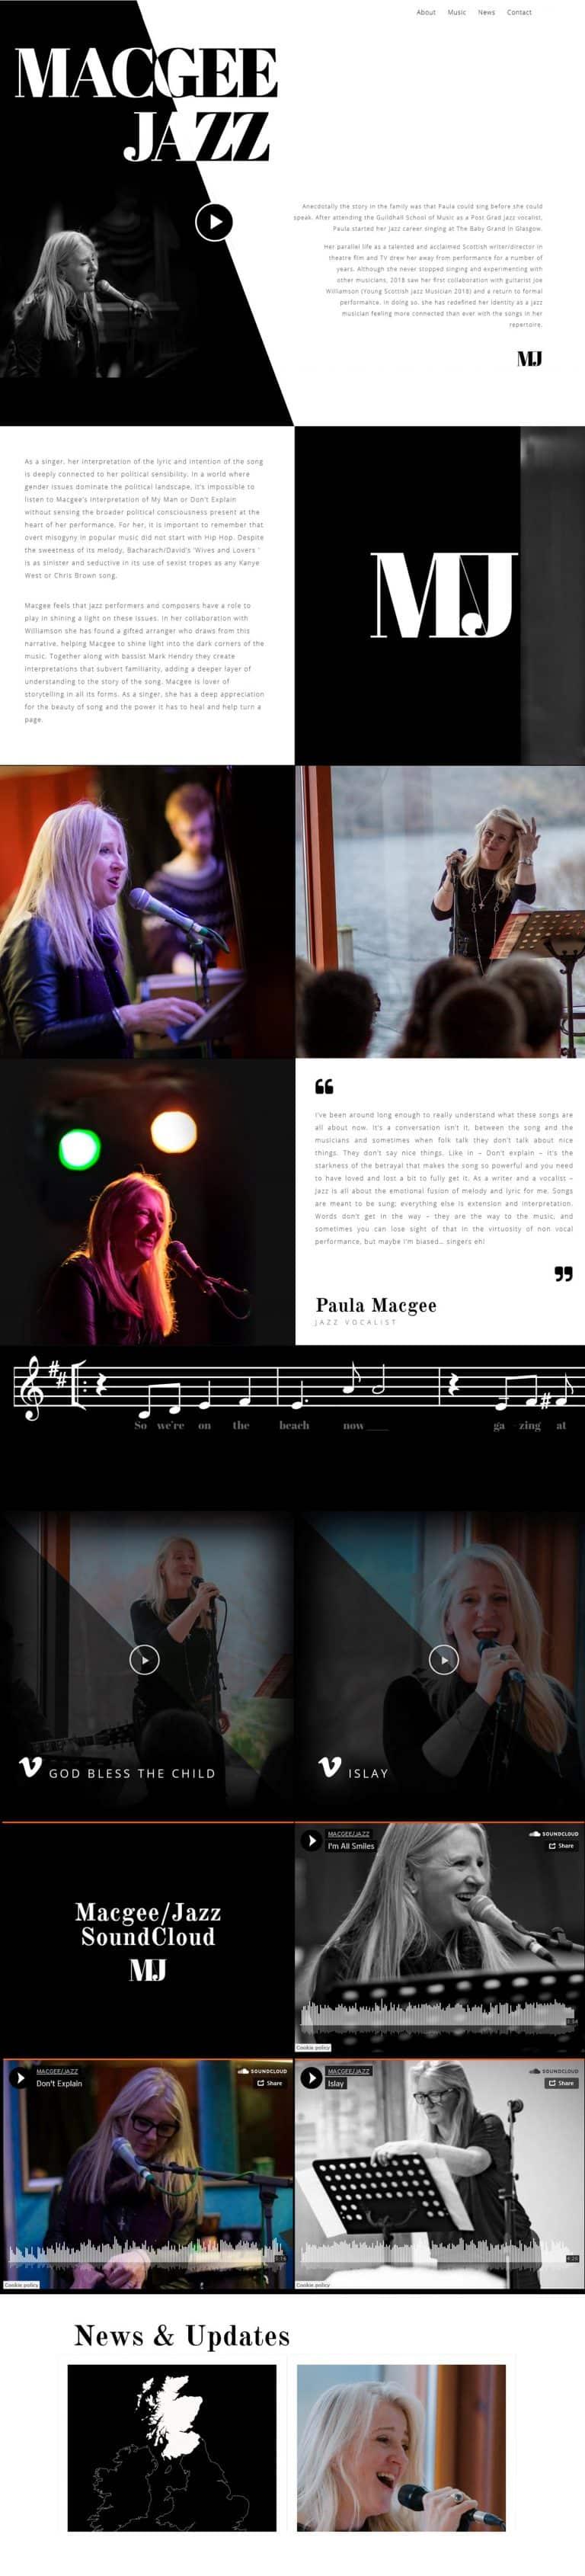 design of website for musician